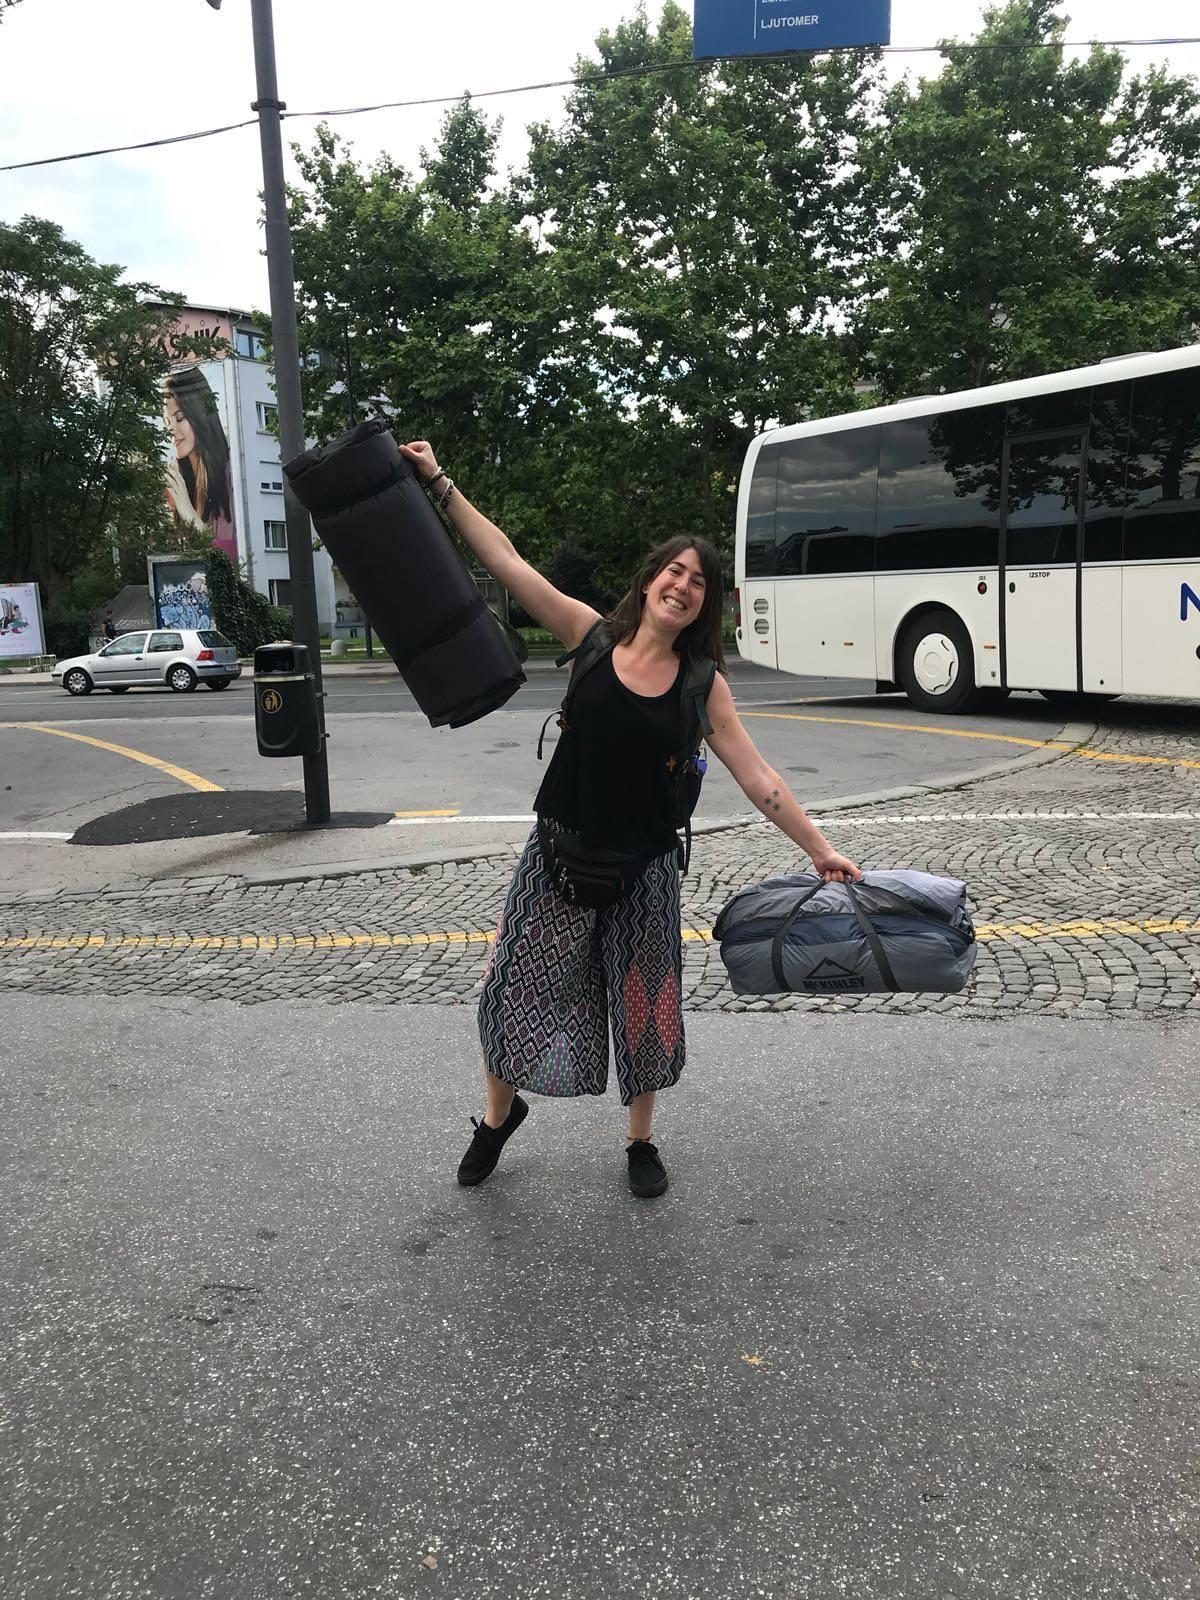 Volunteering in Festivals: Doubling the Fun